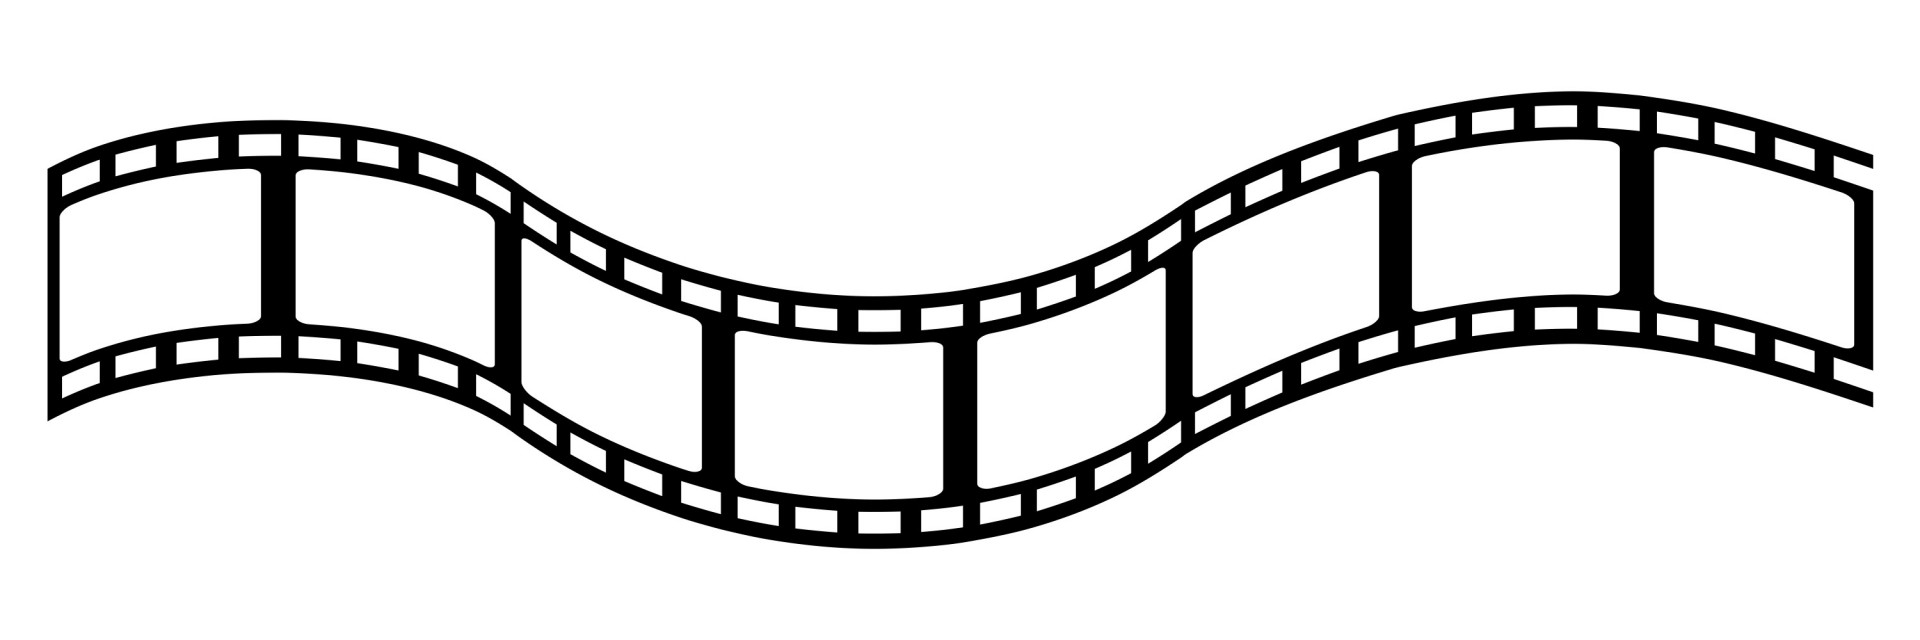 1920x640 Film Strip Movie Reel Vector Clipart